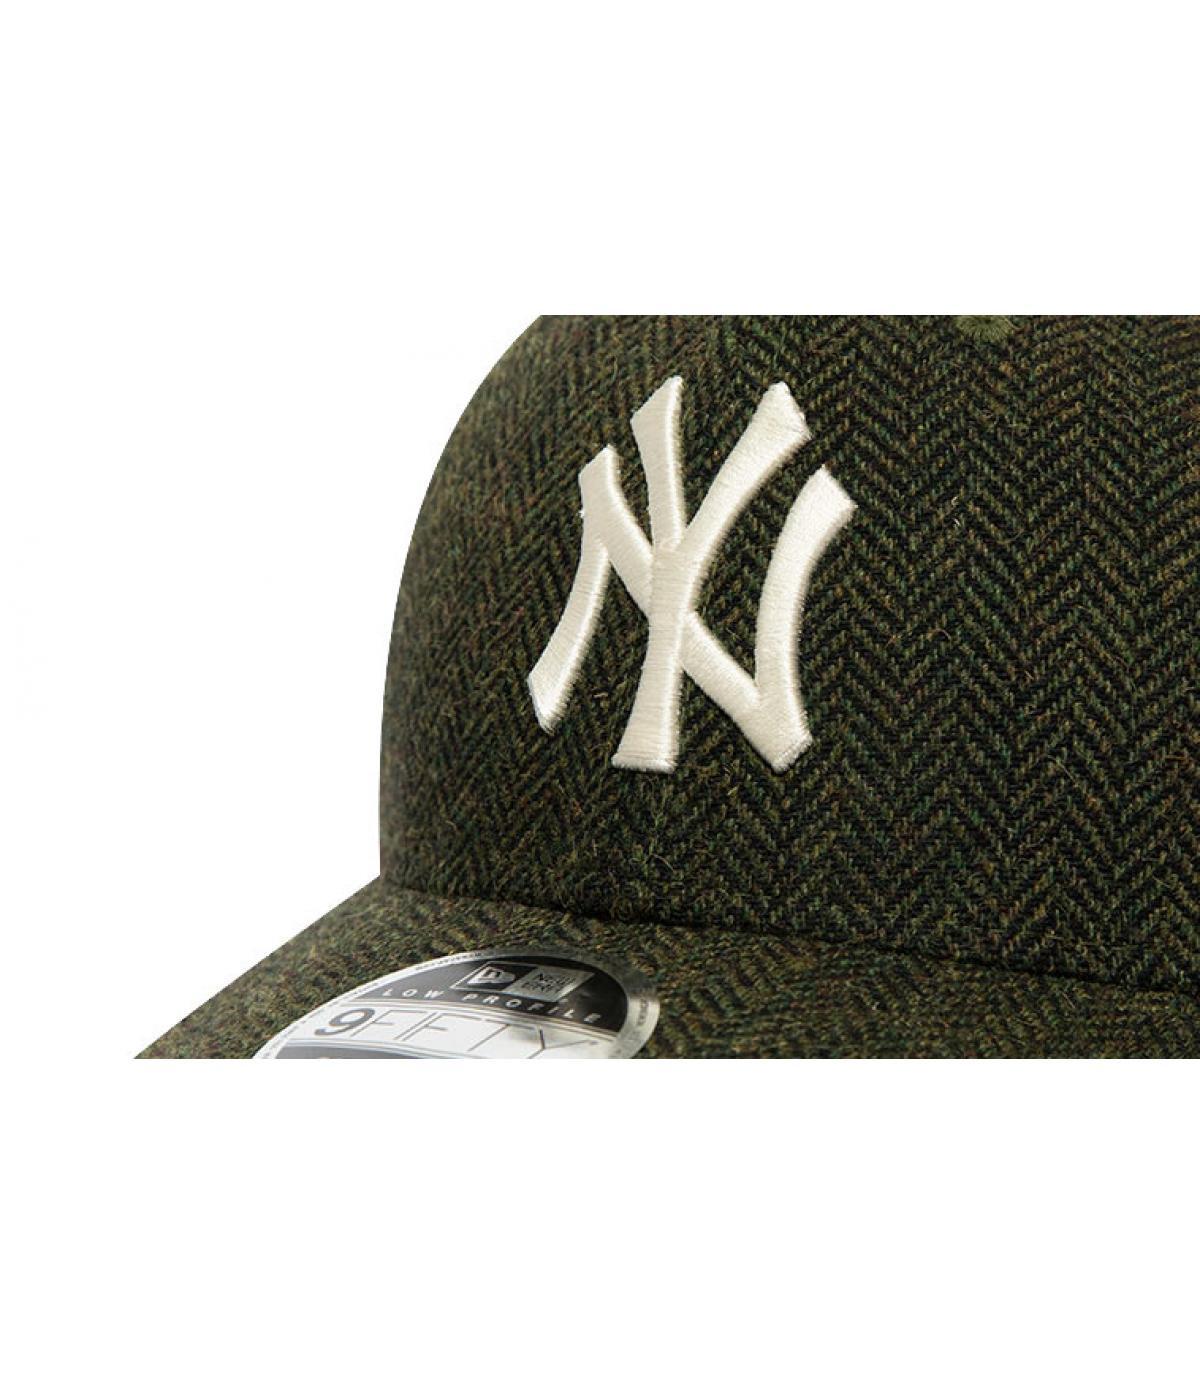 Détails Snapback MLB Tweed NY 950 army green - image 3